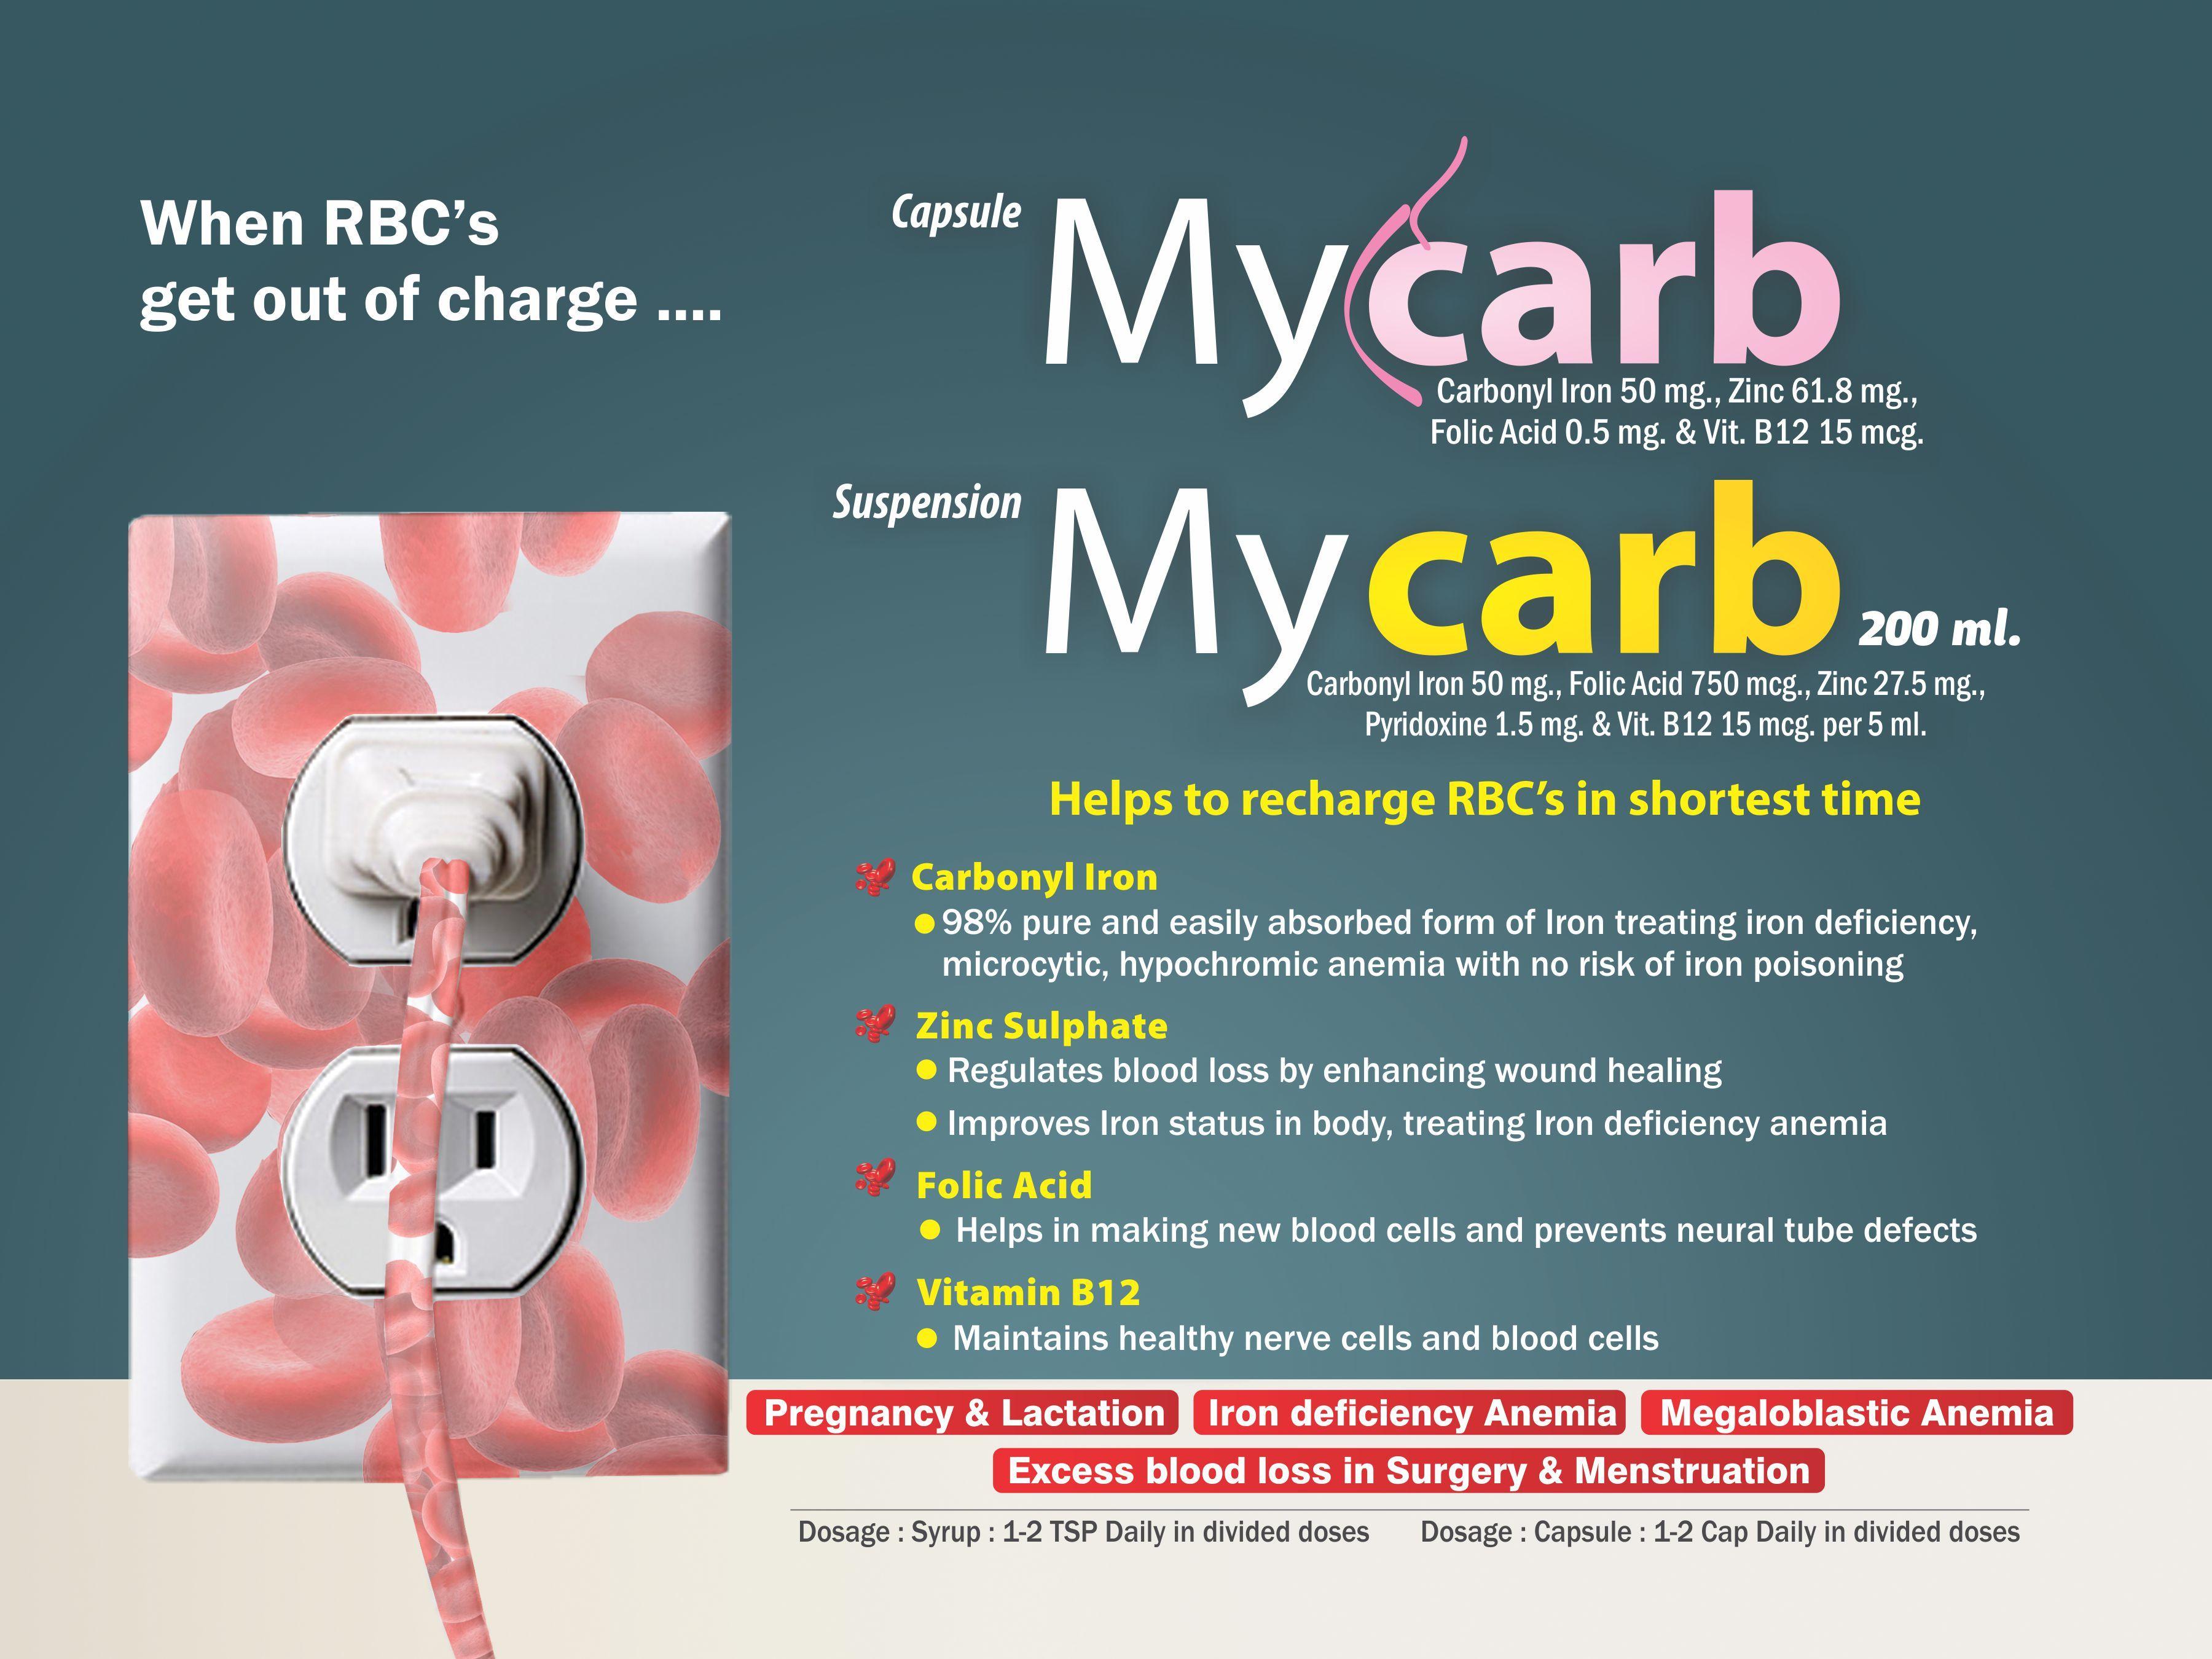 Carbonyl Iron 100 mg,Zinc 61.8 mg,FolicAcid 1.5 mg,Vitamin B12-15 mcg, Vit. C 75 mg Capsule